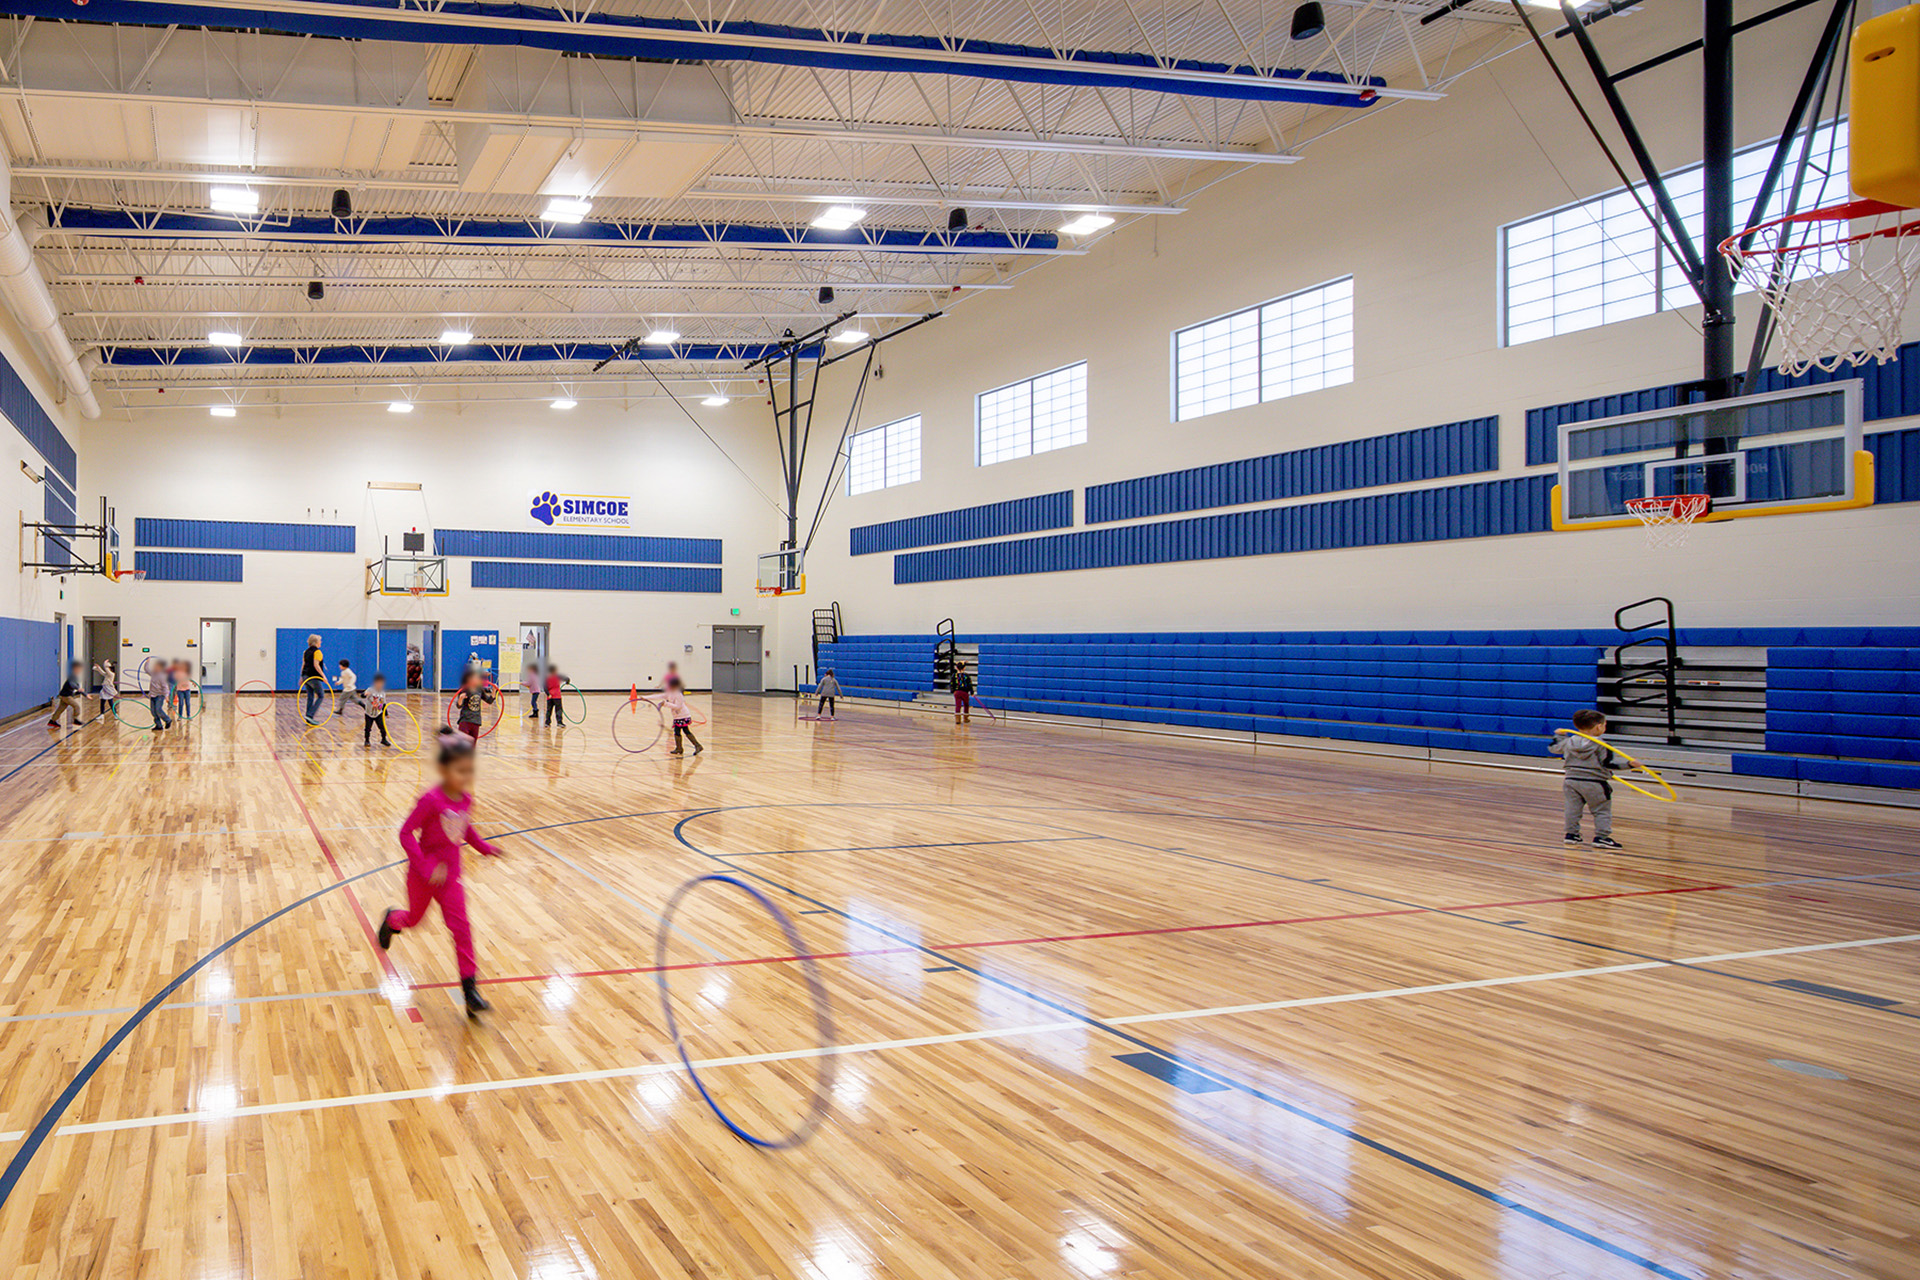 Simcoe Elementary Gym